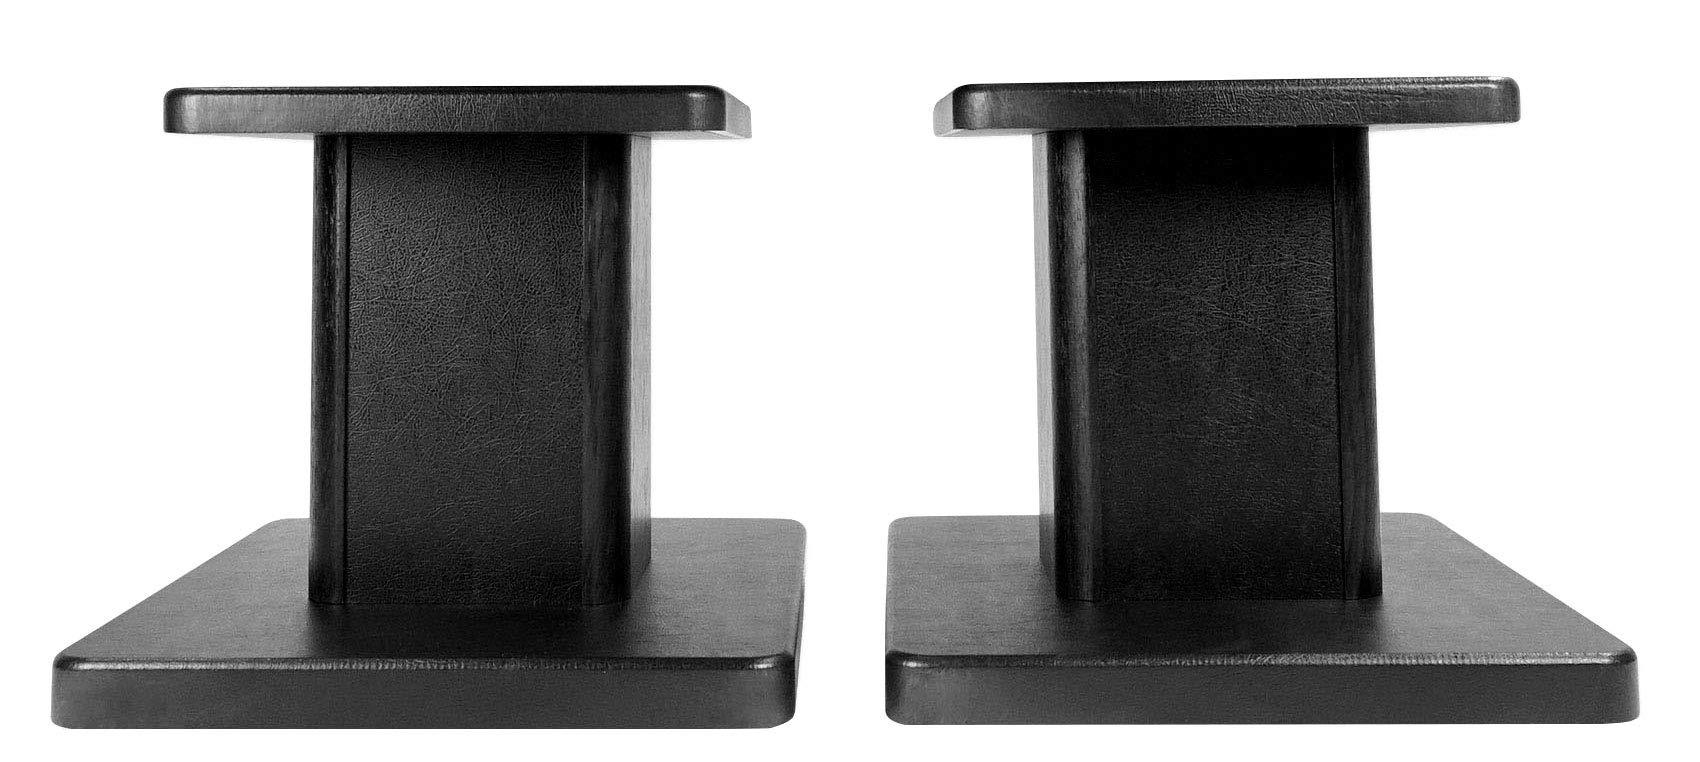 Rockville Pair Computer/Bookshelf Desktop Speaker/Studio Monitor Stands (RHT8G) by Rockville